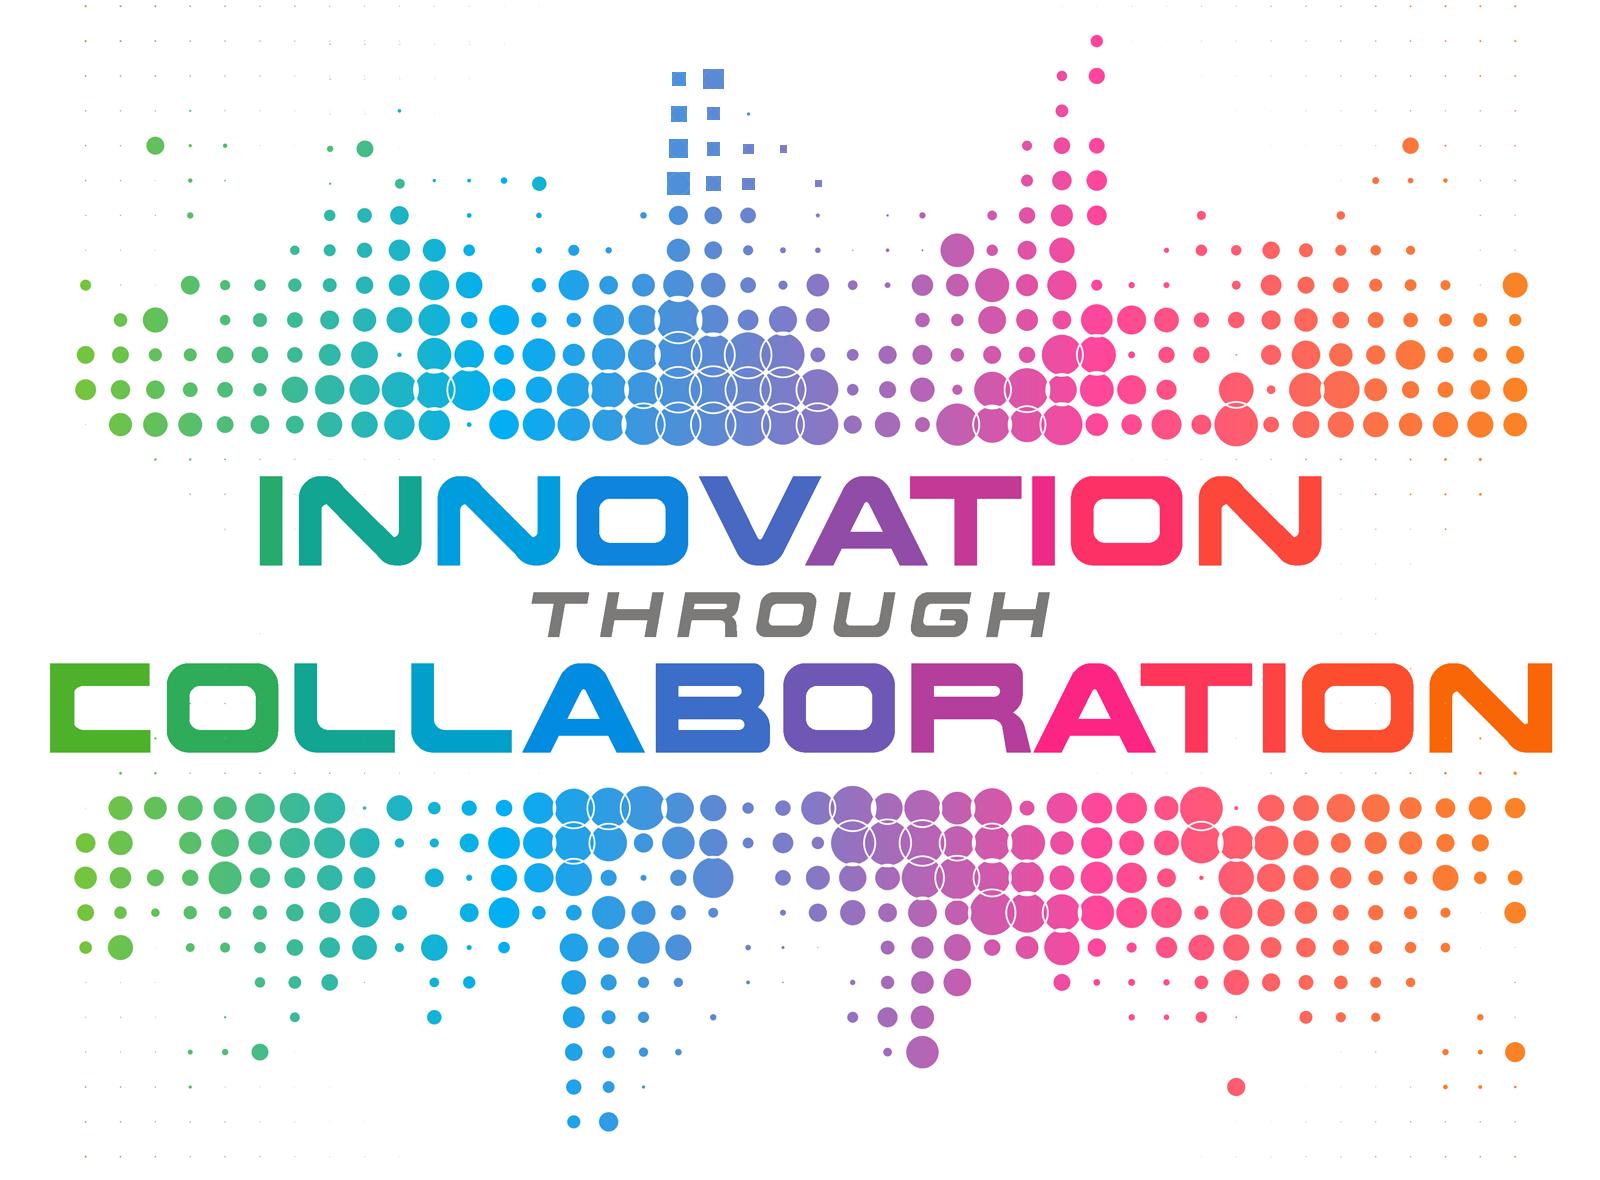 Innovation through Collaboration